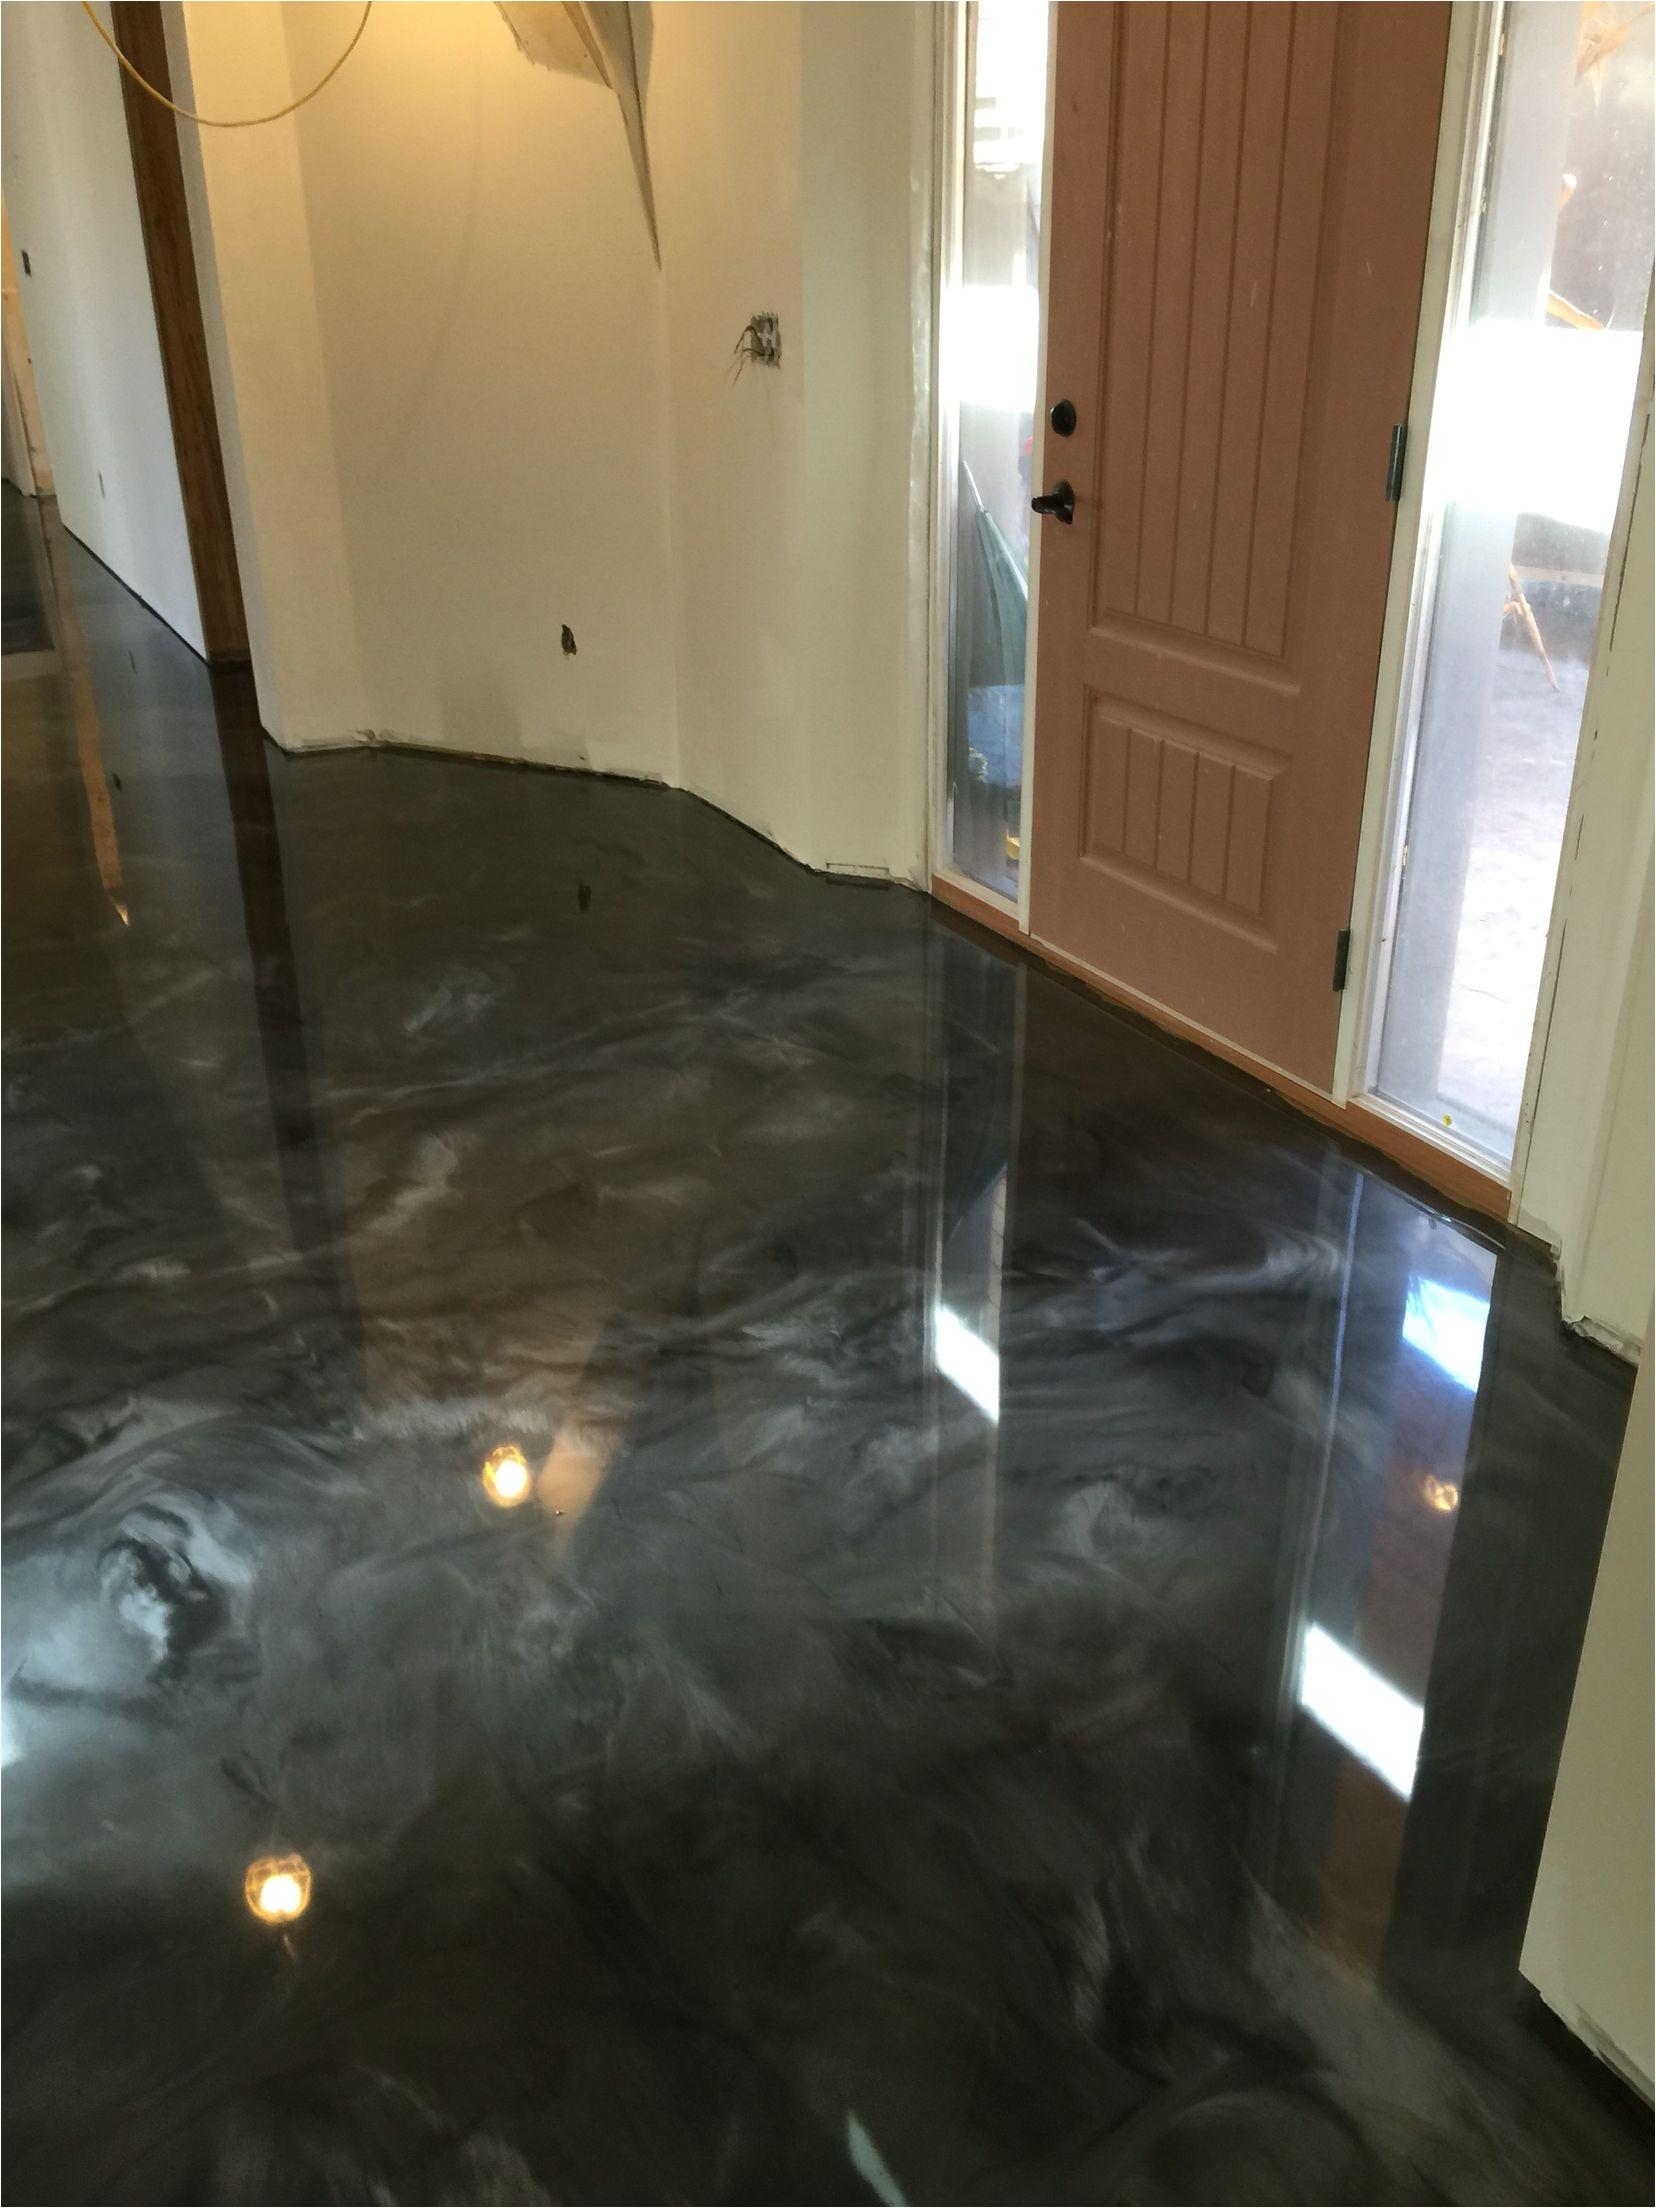 Elite Garage Floors Nh Metallic Epoxy Floor Coating by Sierra Concrete Arts Interior